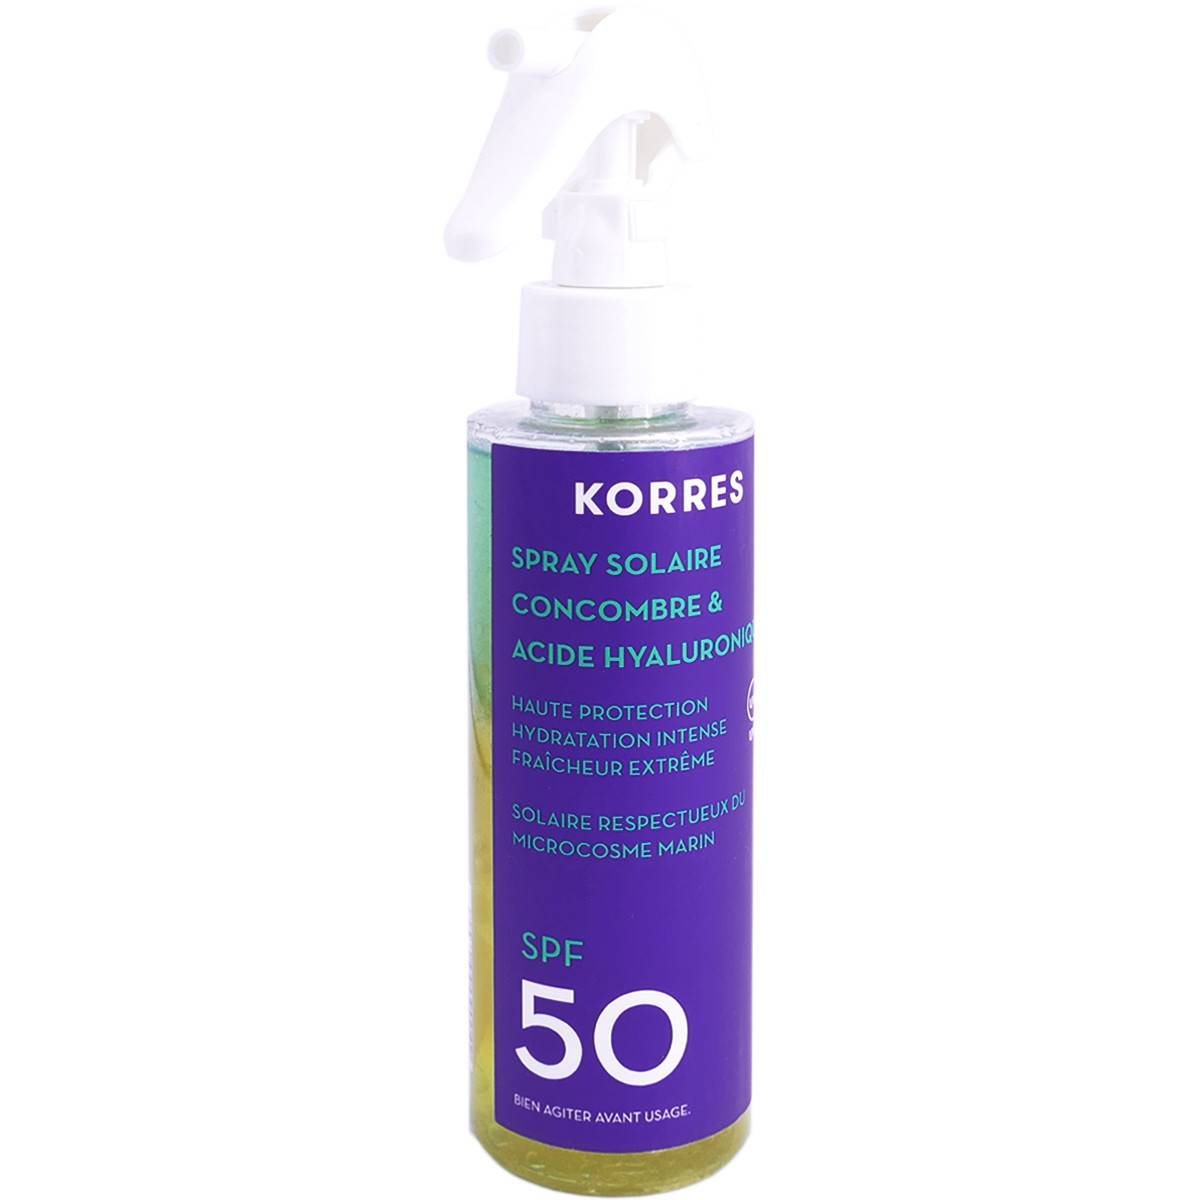 Korres spray solaire concombre & acide hyaluronique spf50 150ml